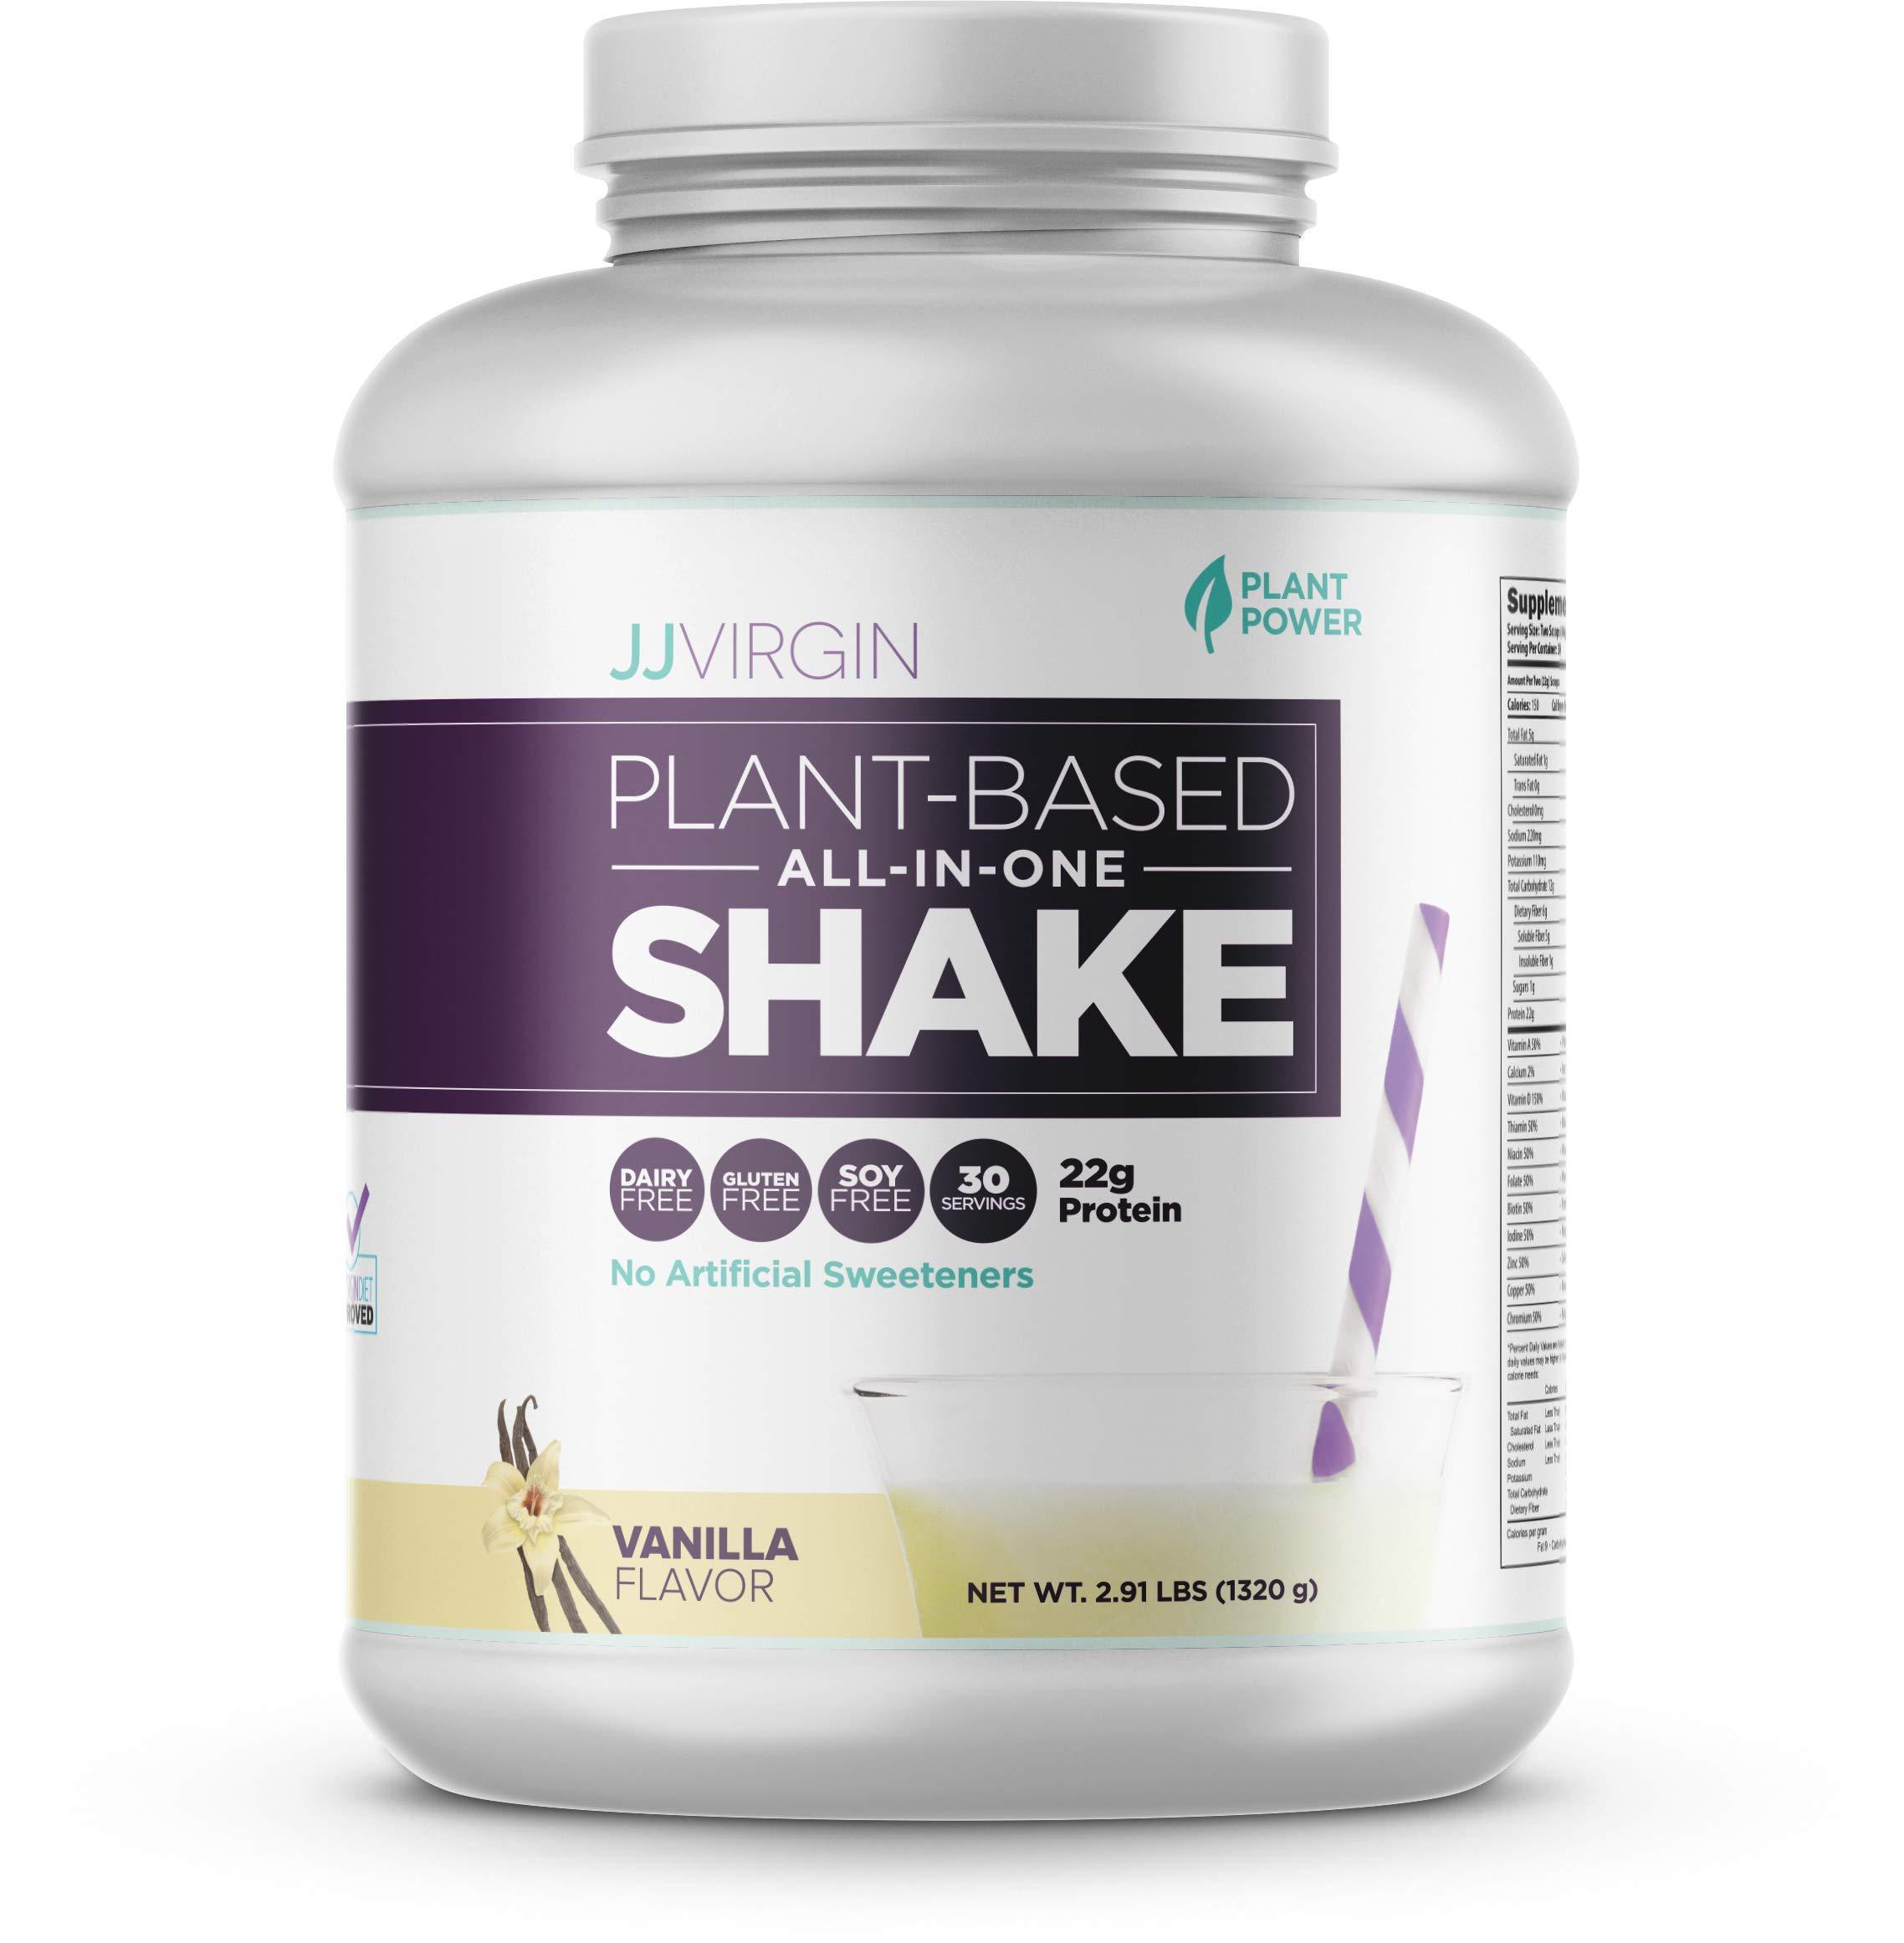 JJ Virgin Vanilla Plant-Based All-in-One Shake - Vegetarian-Friendly Protein Powder (30 Servings, 2.91 Pounds) by JJ VIRGIN